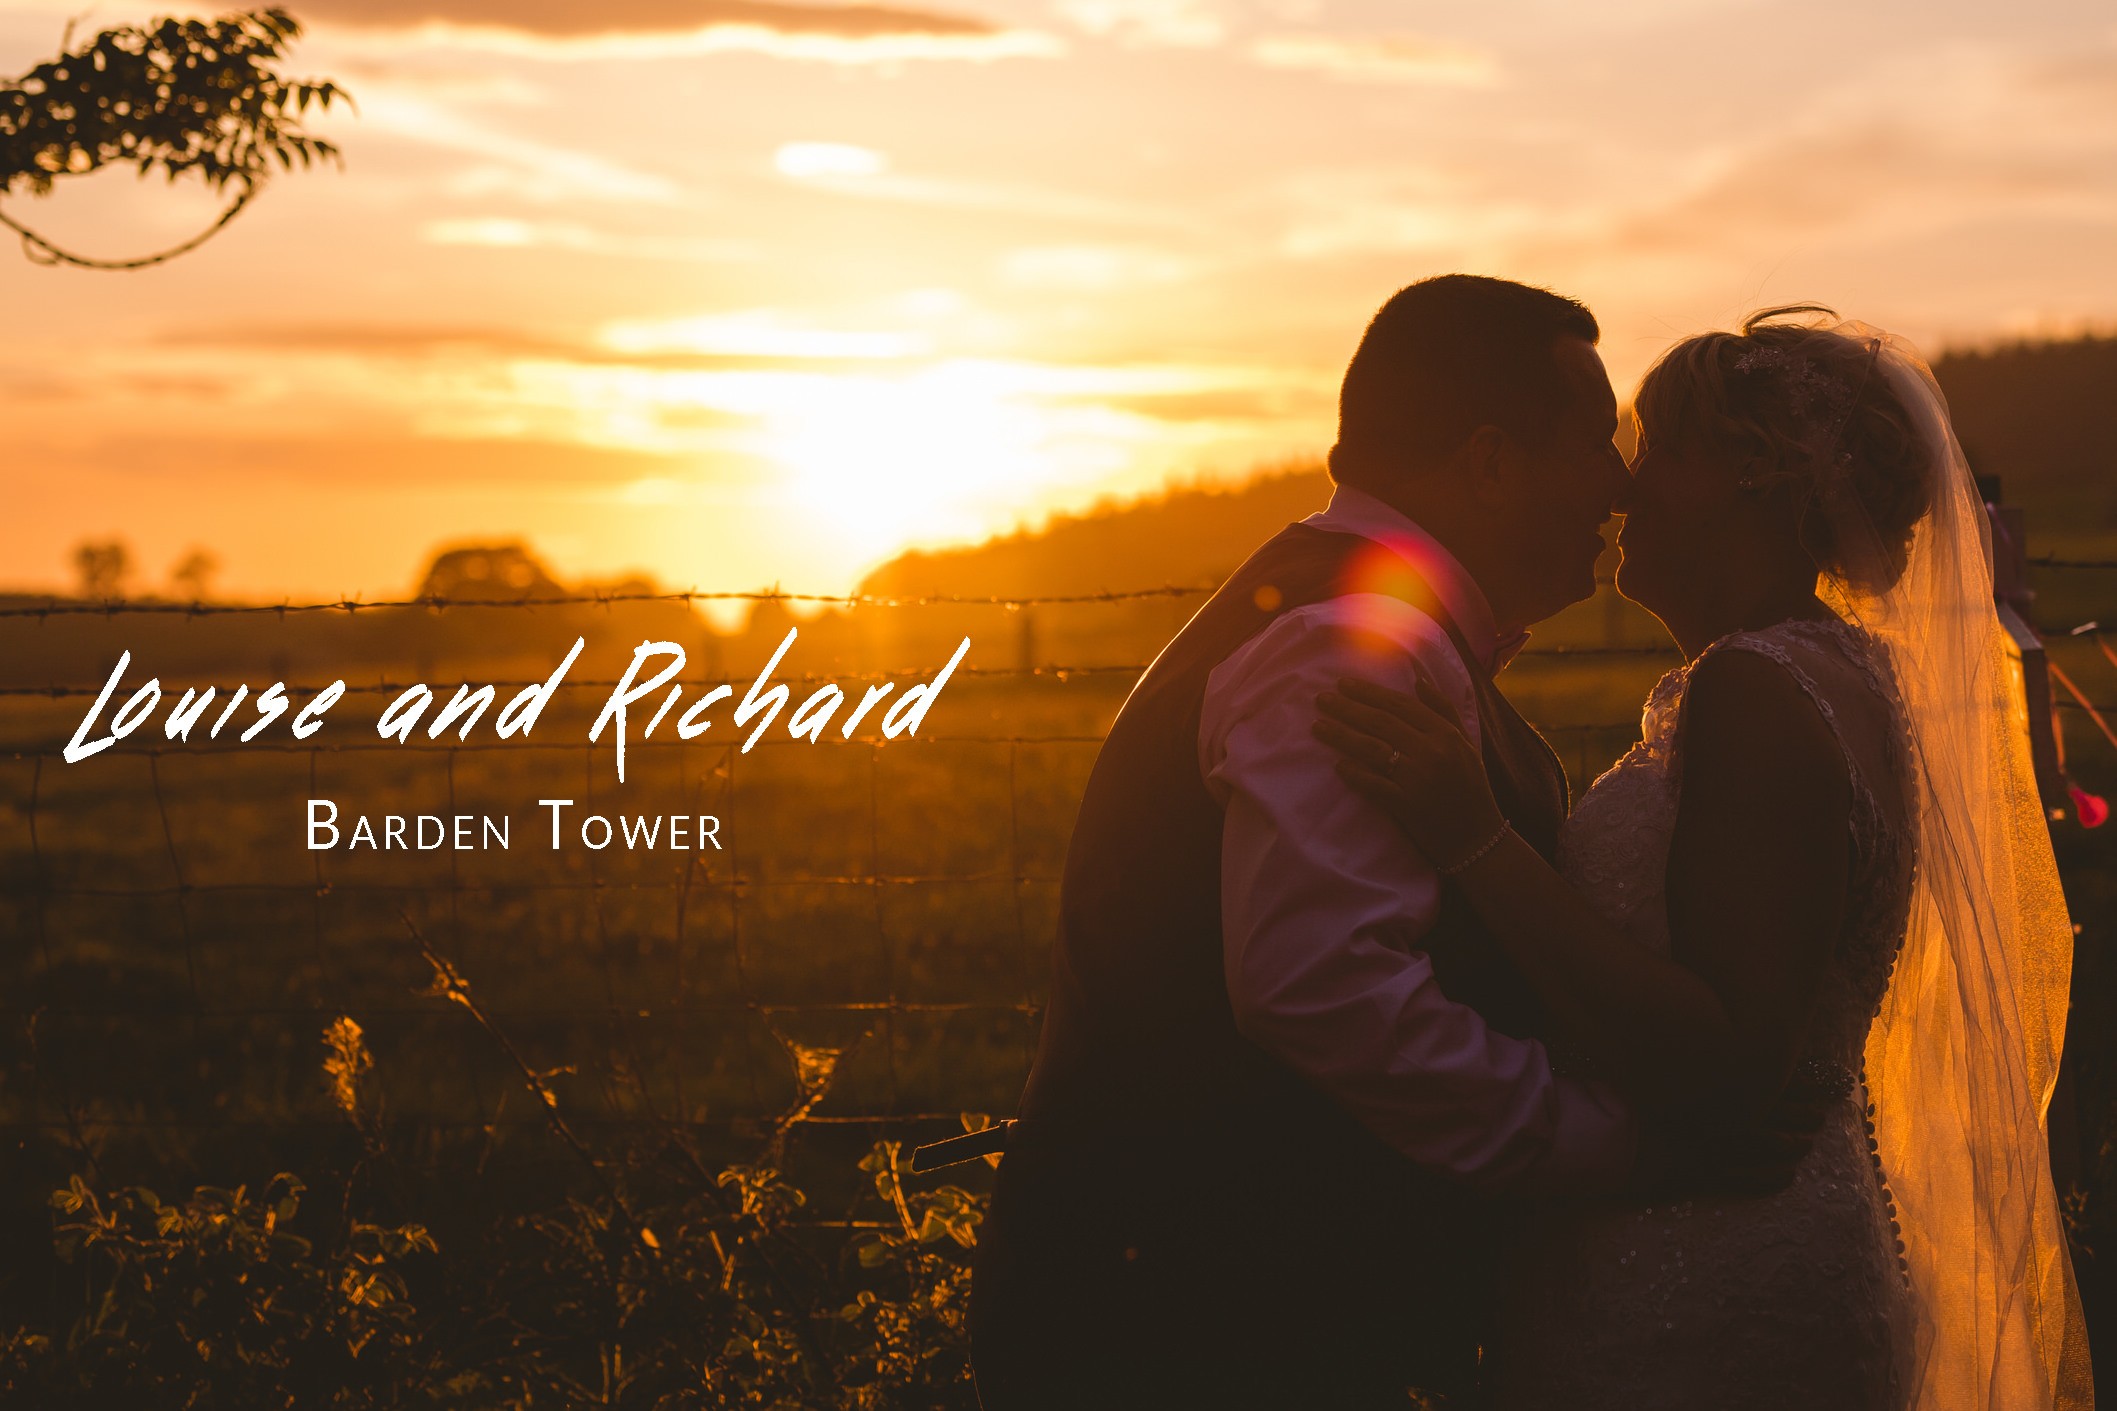 Barden-Tower-Plate.jpg